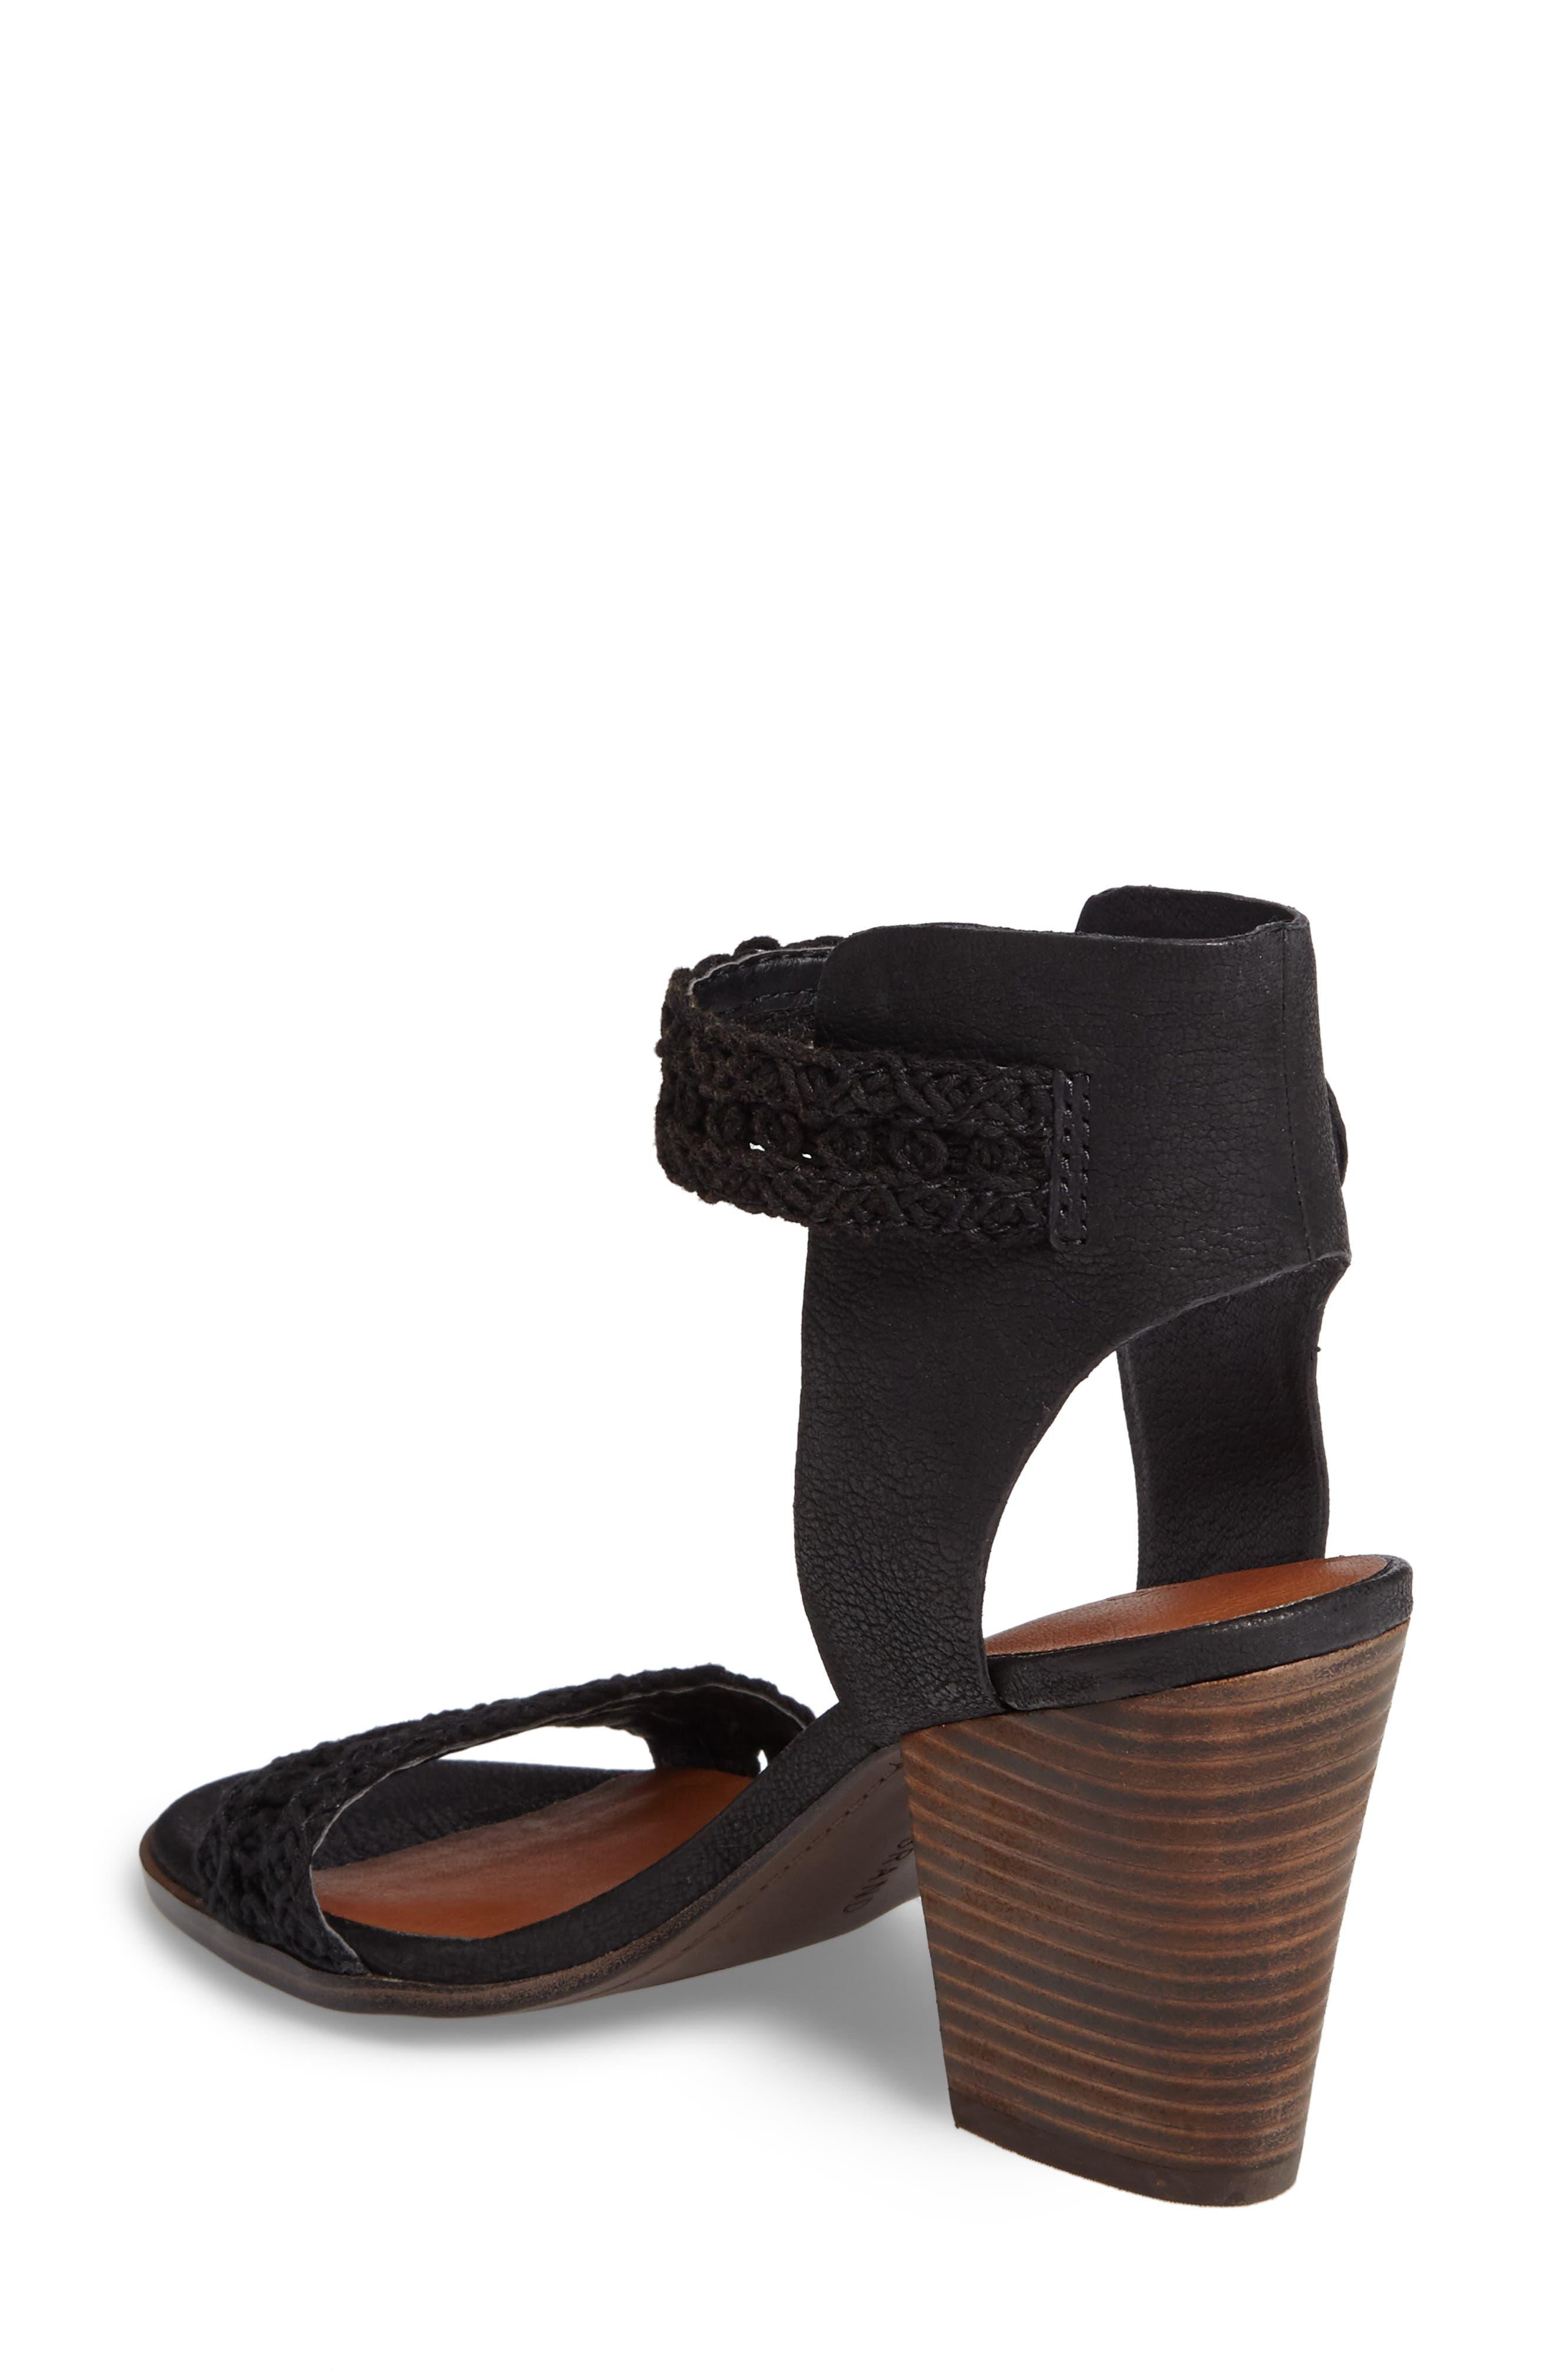 Oakes Ankle Strap Sandal,                             Alternate thumbnail 2, color,                             Black Leather